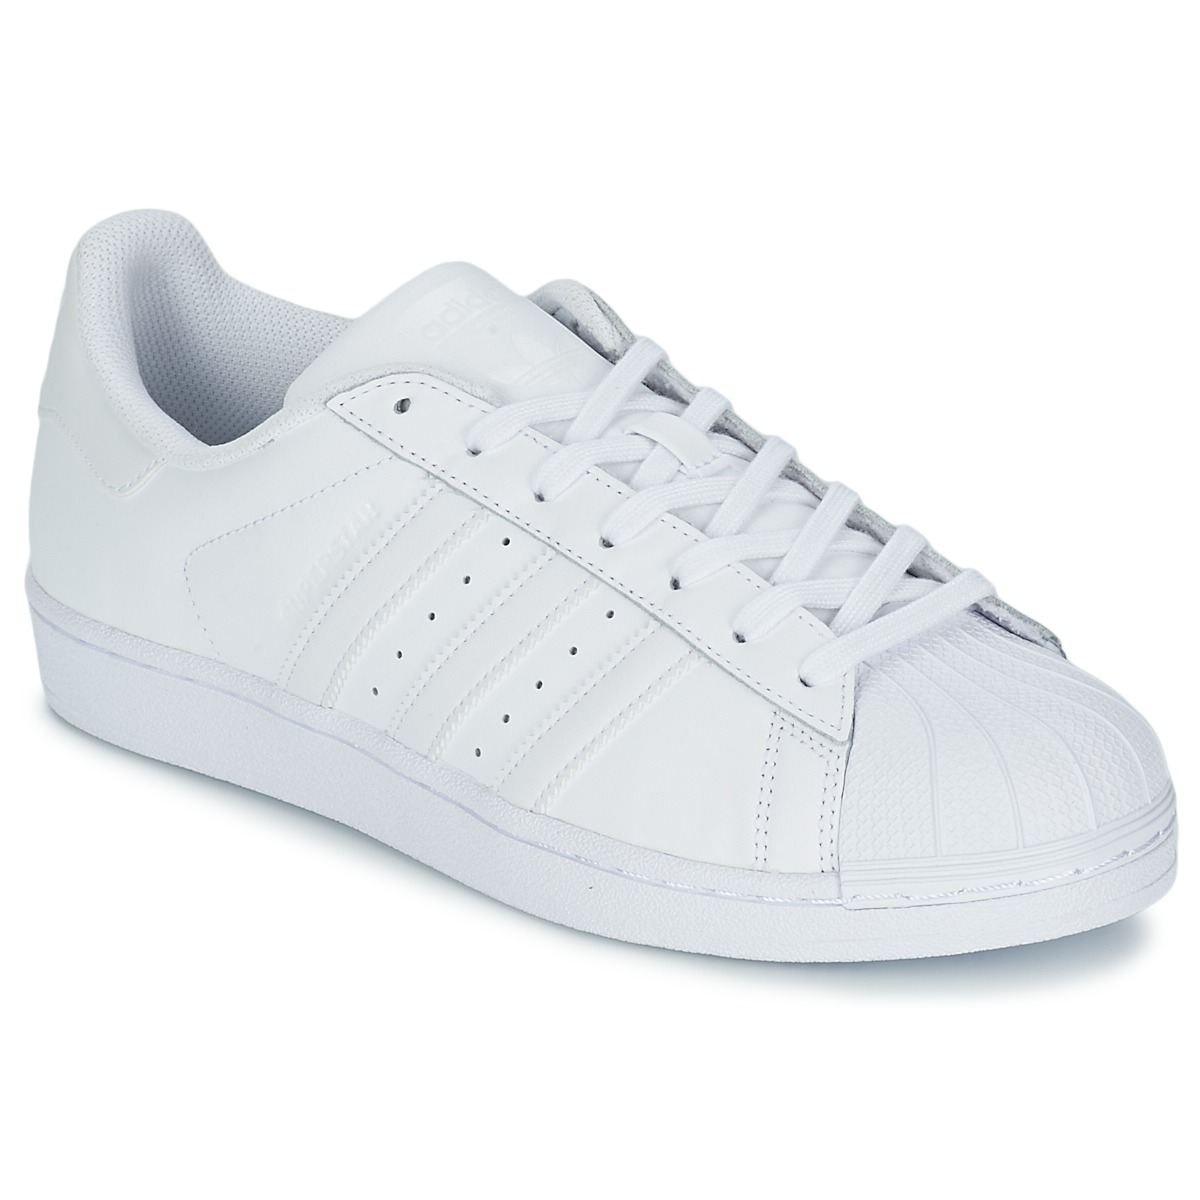 adidas Originals SUPERSTAR FOUNDATION Άσπρο - Δωρεάν Αποστολή στο  Spartoo.gr ! - Παπούτσια Χαμηλά Sneakers 102 2a4c39f1d1d